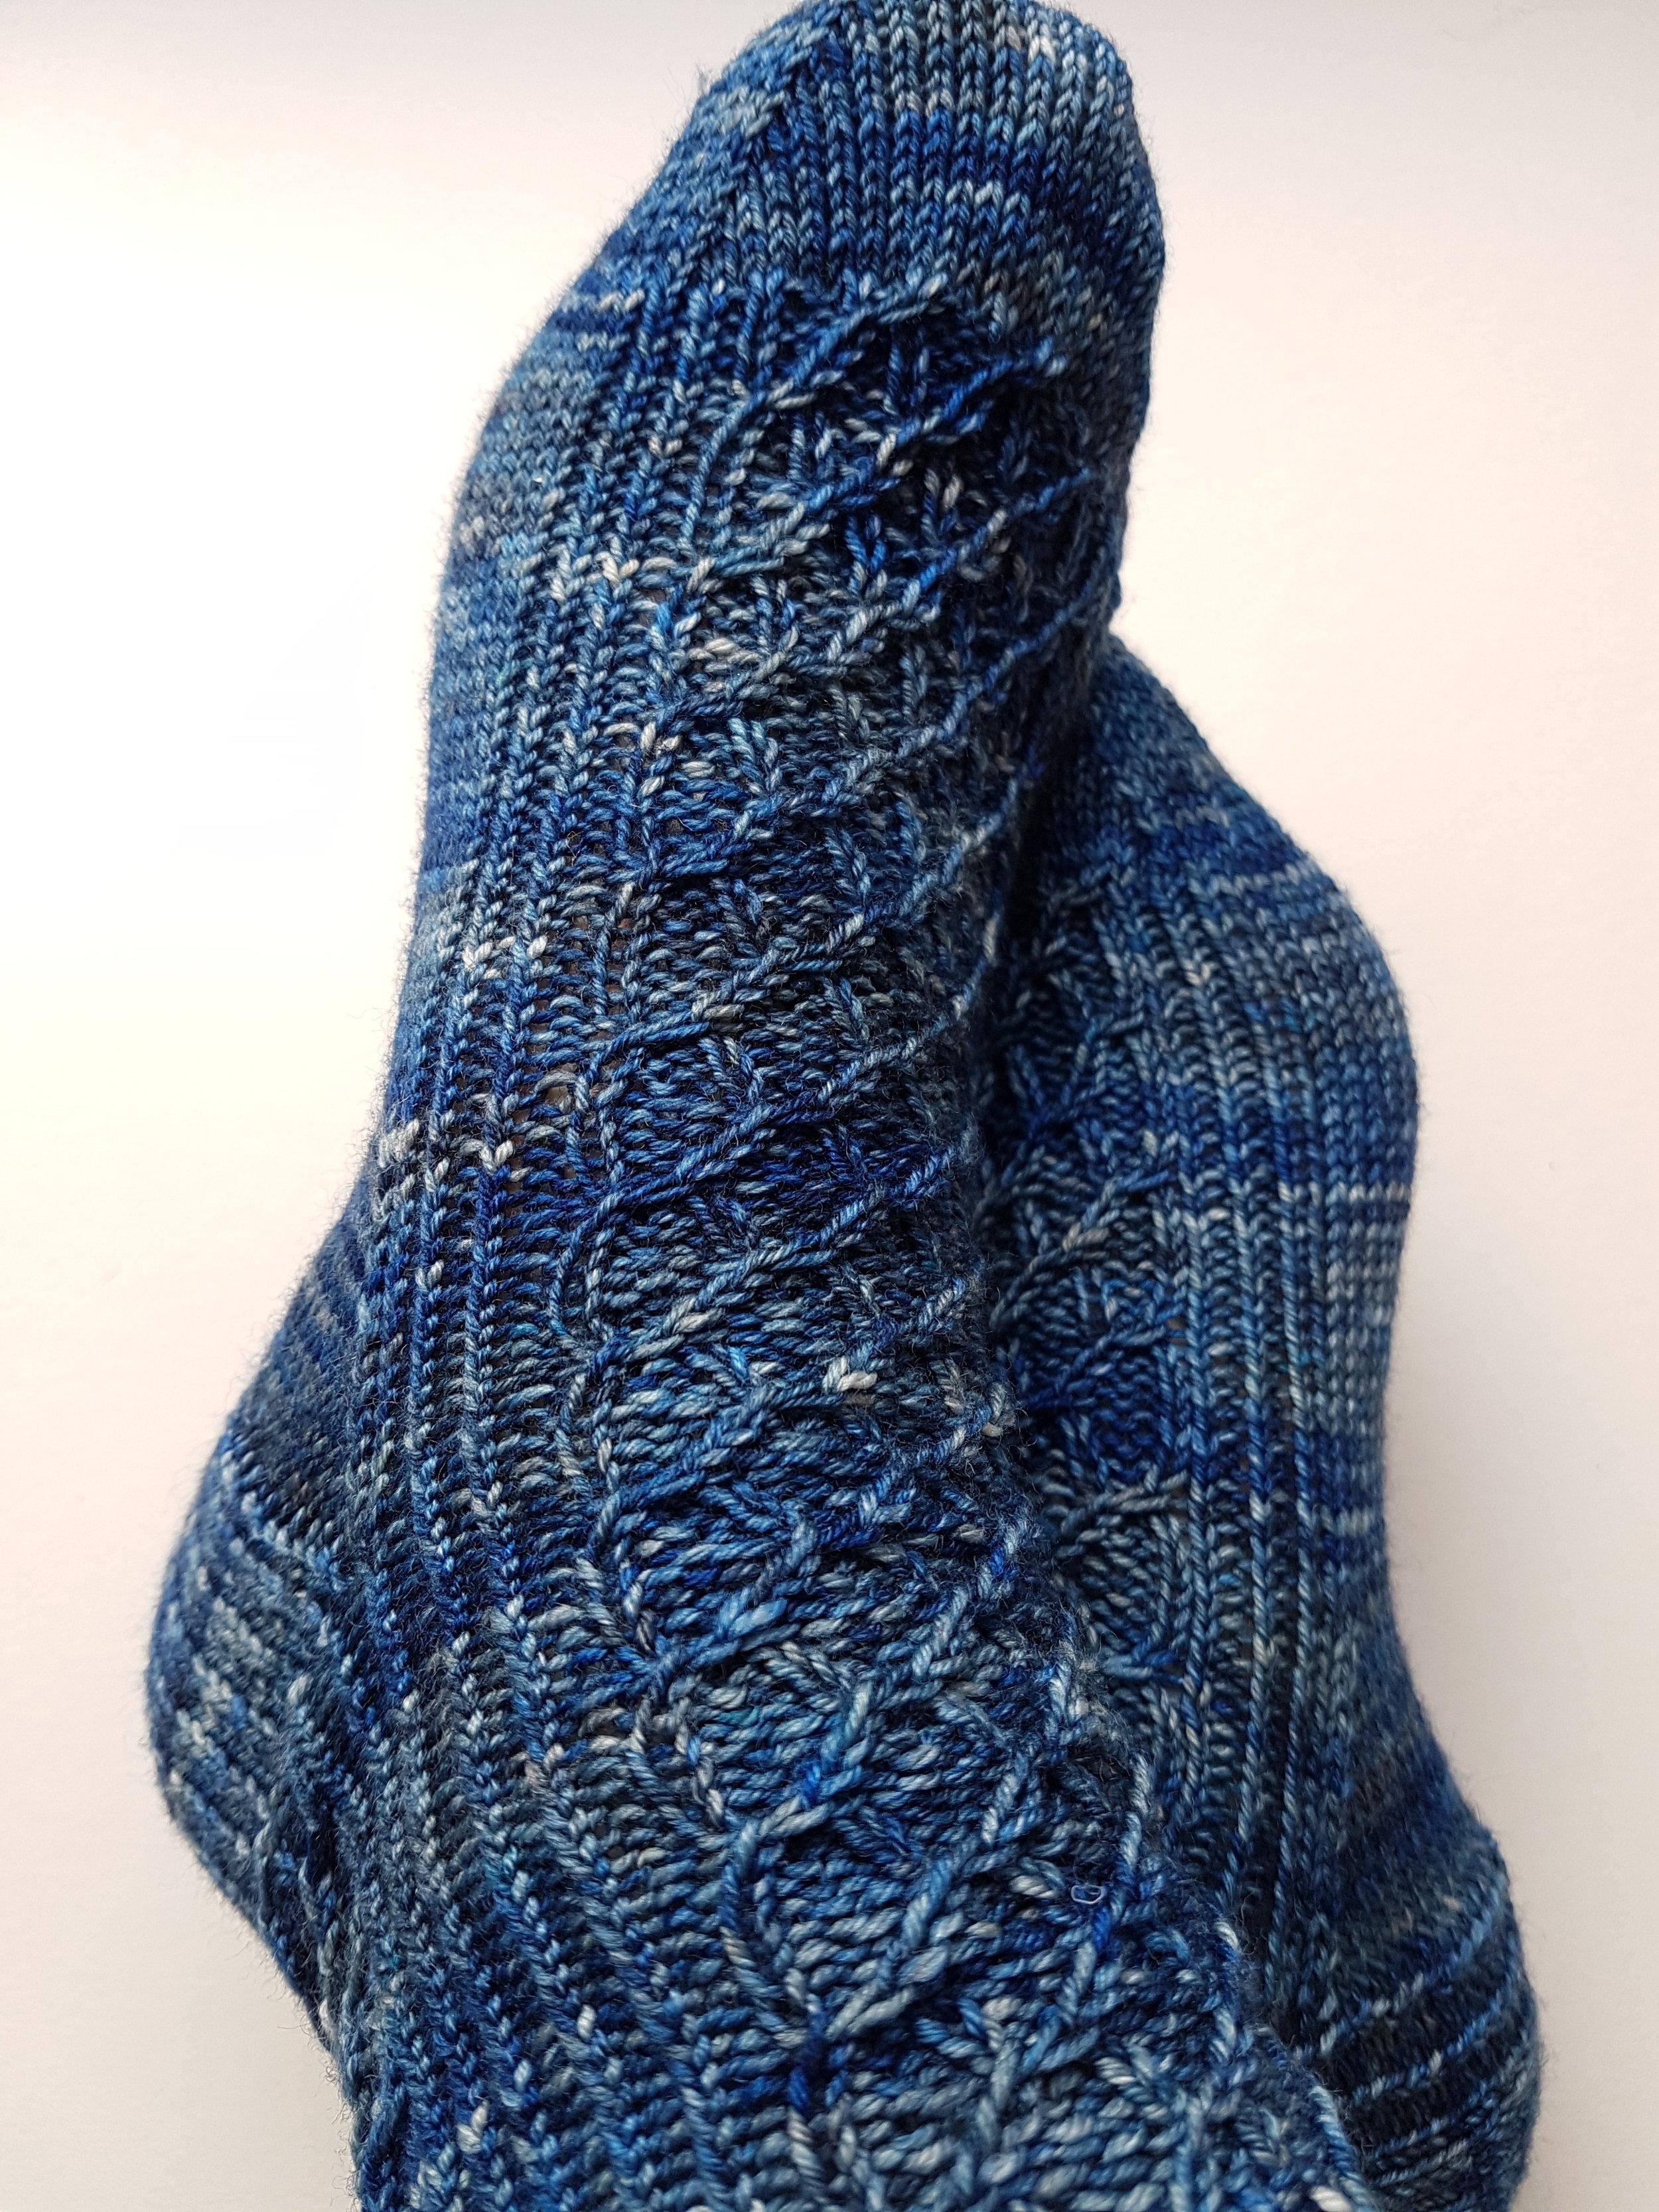 Catbells: a unisex cuff-down sock